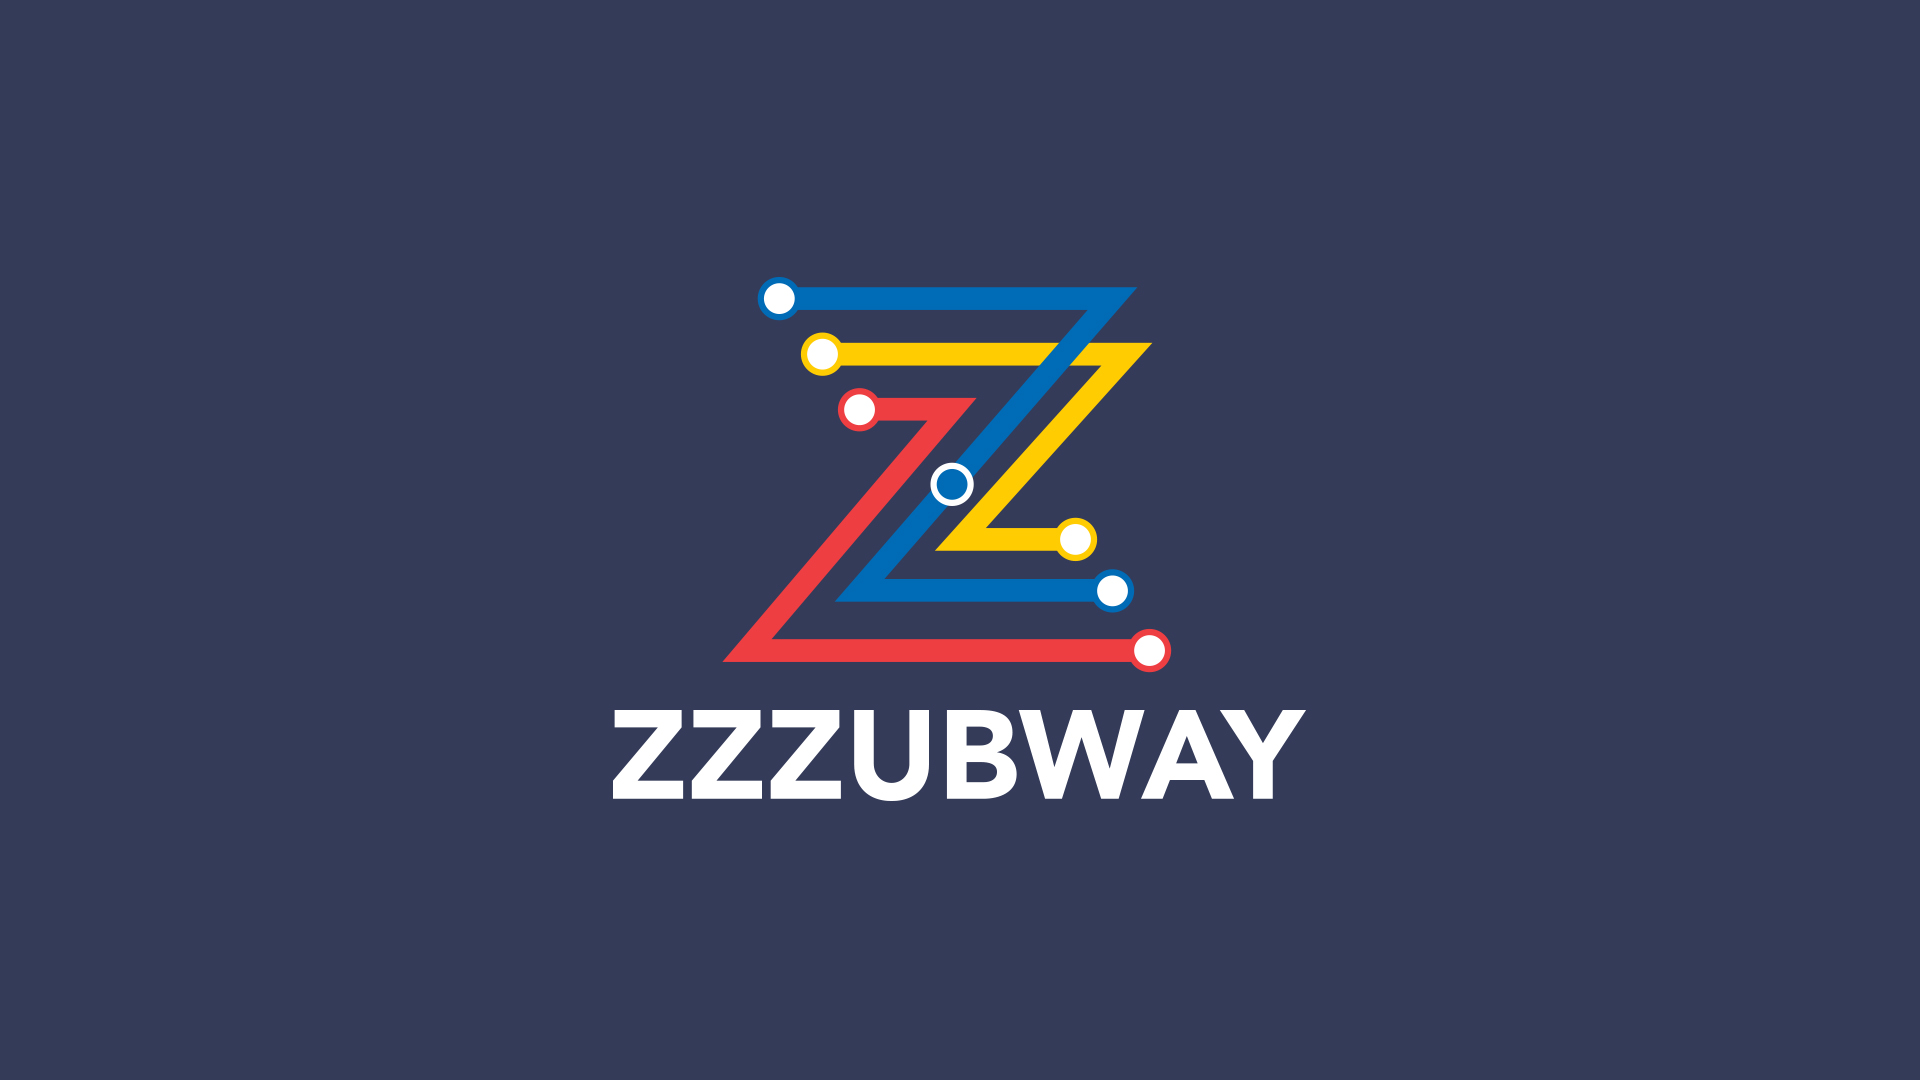 port_zzzubway_logo.jpg